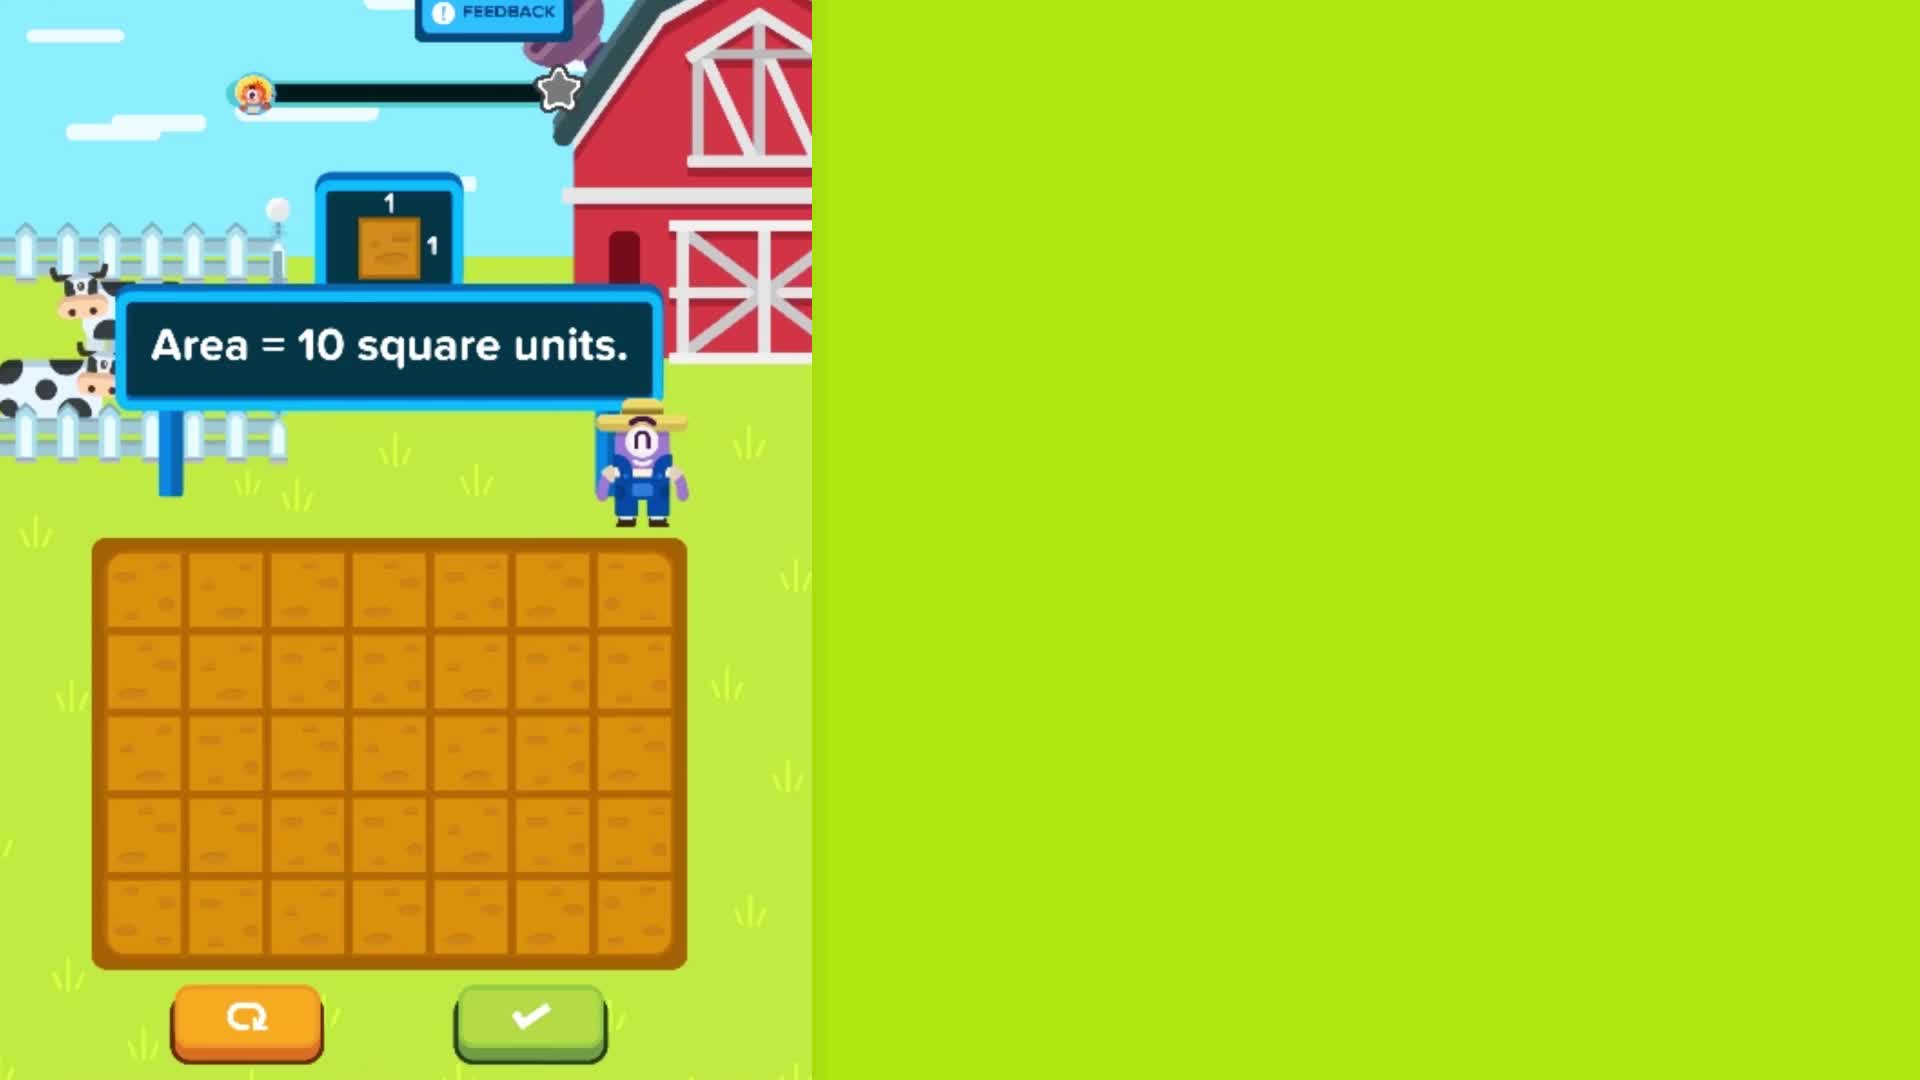 Fency farm level 1 - area and perimeter